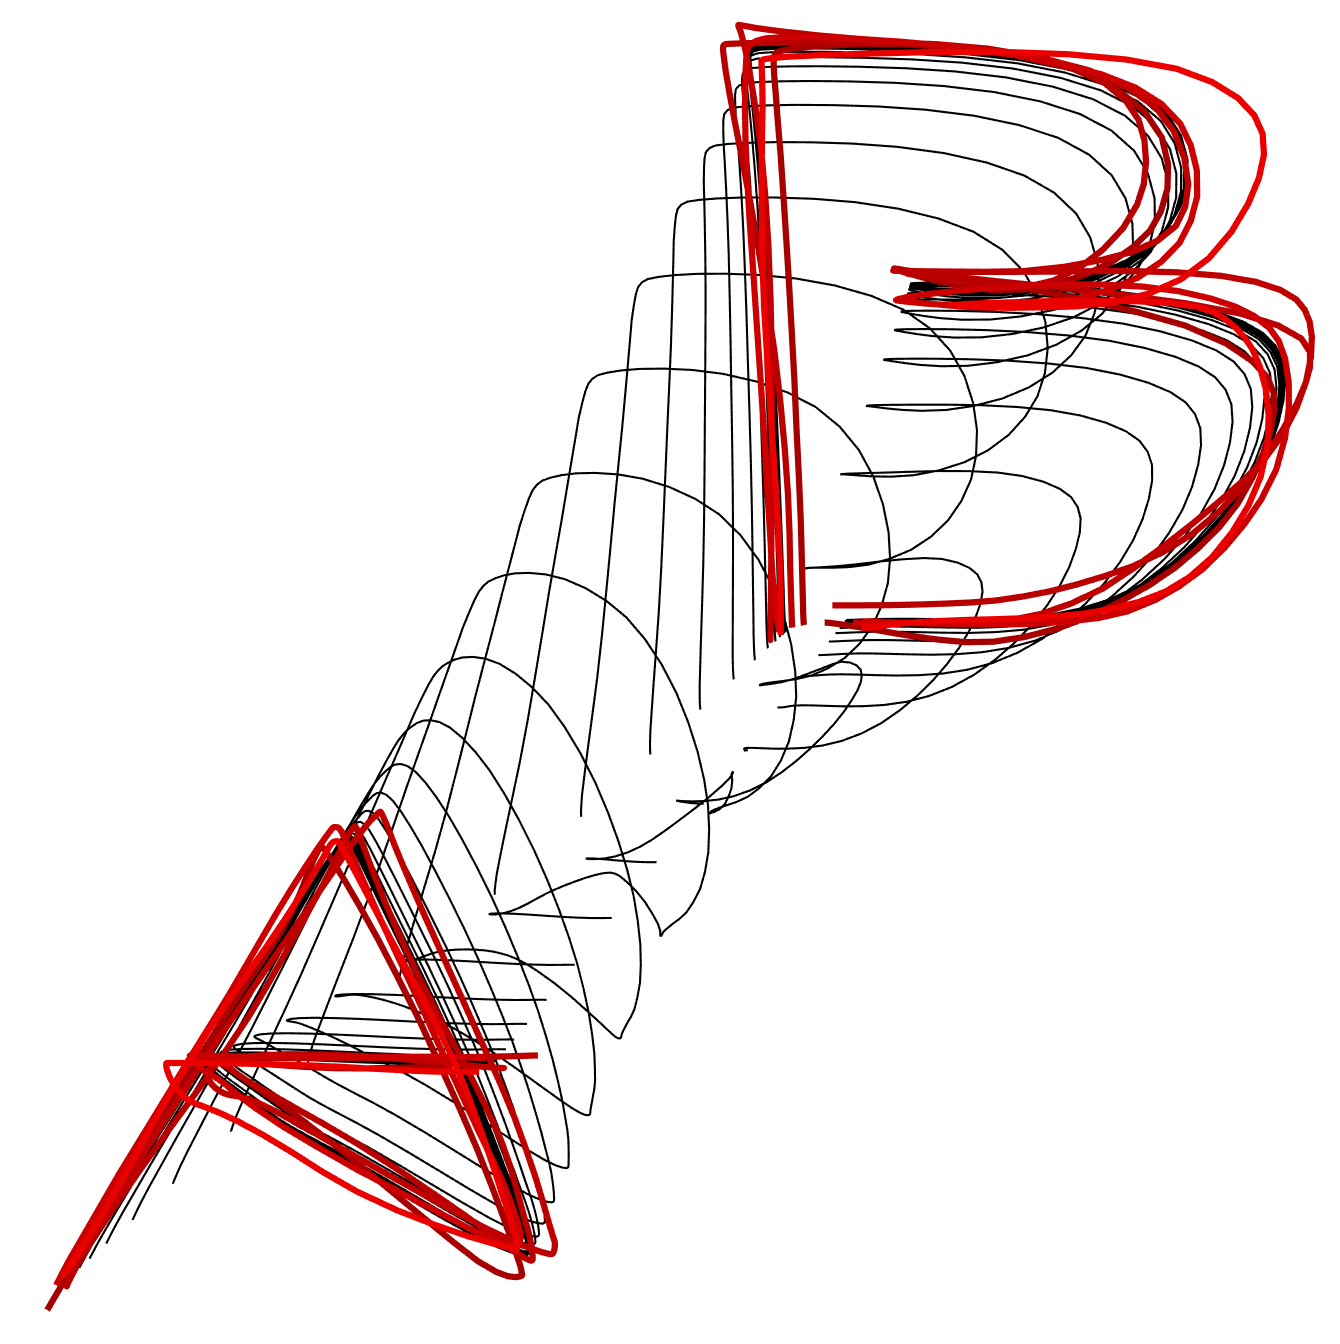 images/demo_Riemannian_cov_interp03.png